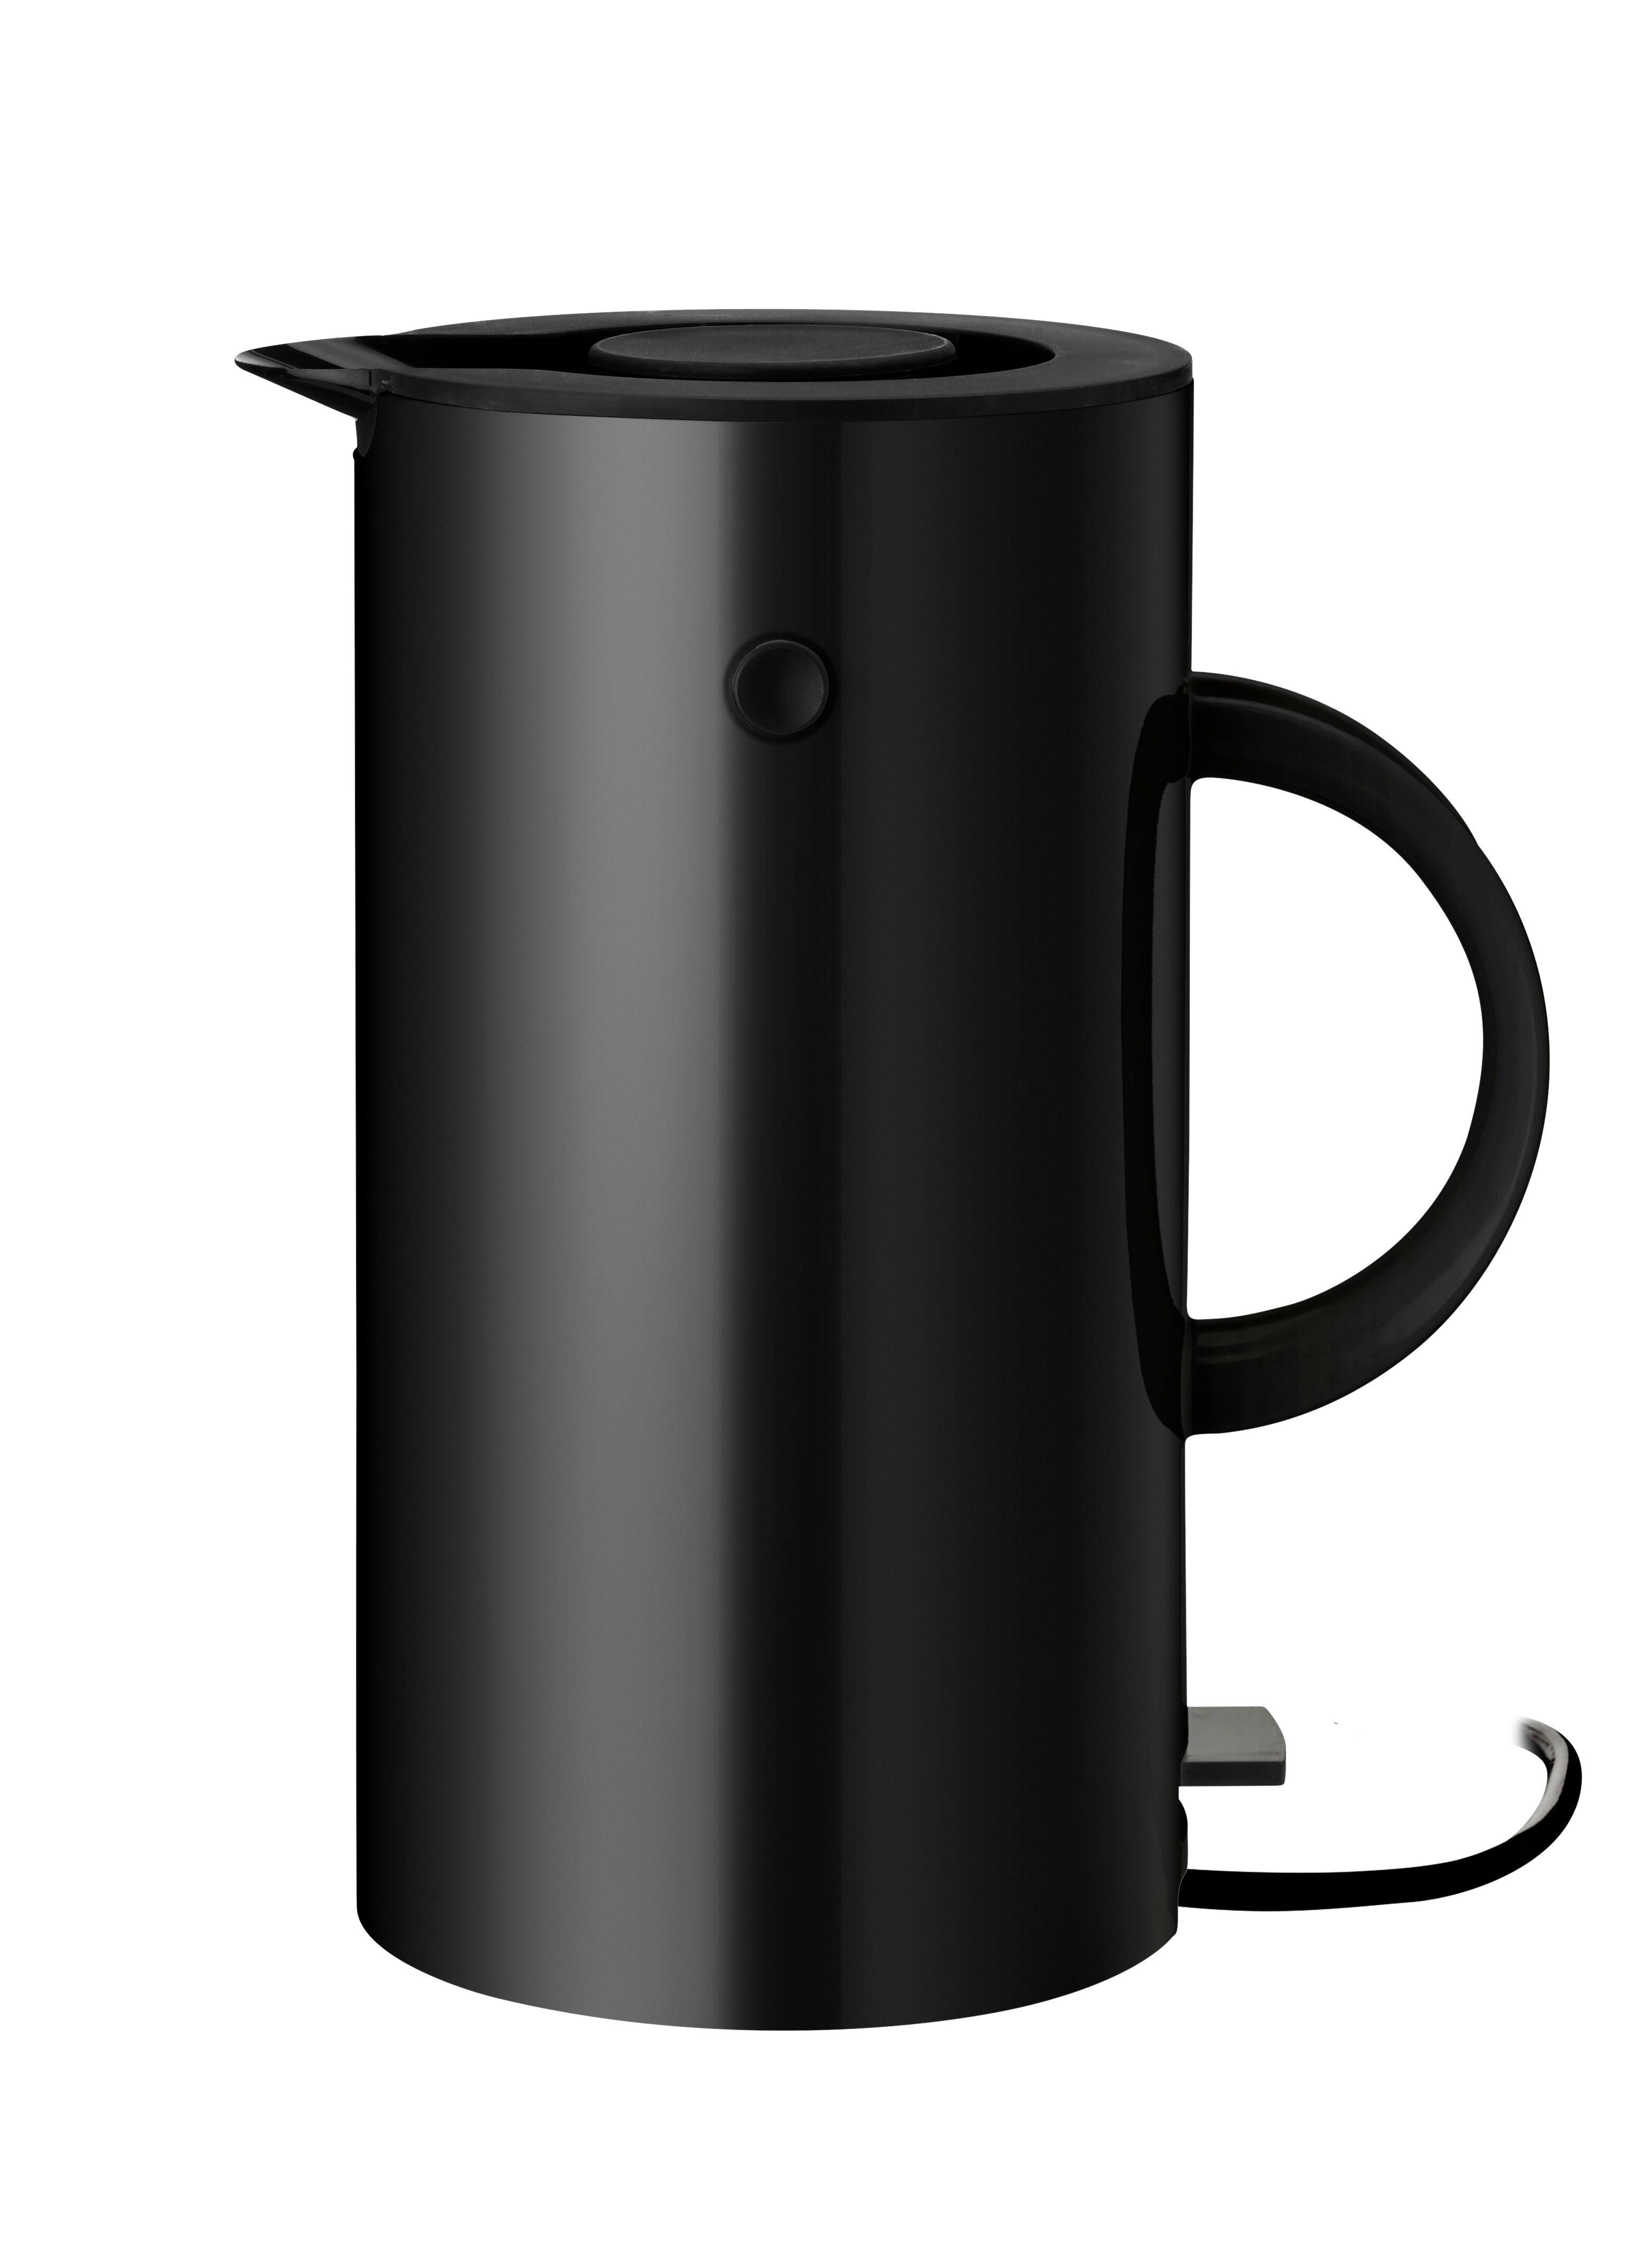 Stelton - EM77 Electric Kettle 1,5 L - Black (890)